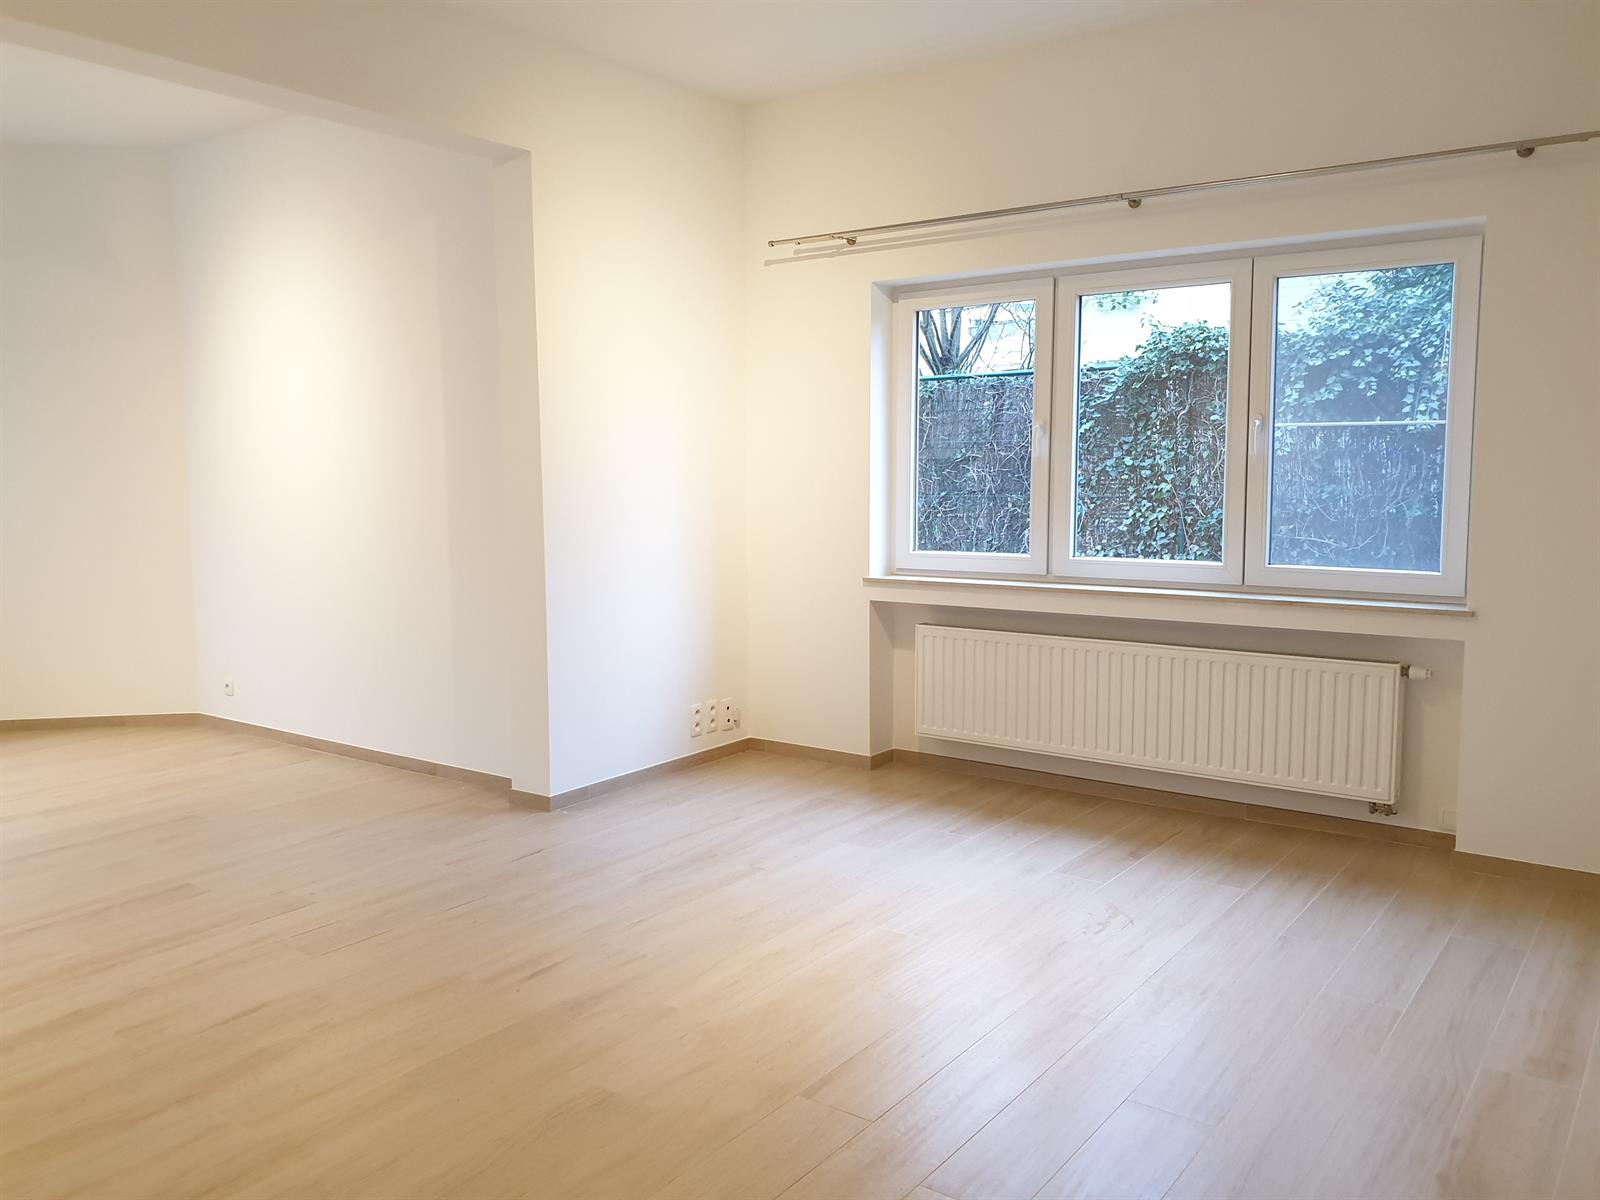 Gelijkvloerse verdieping - Uccle - #4241175-8